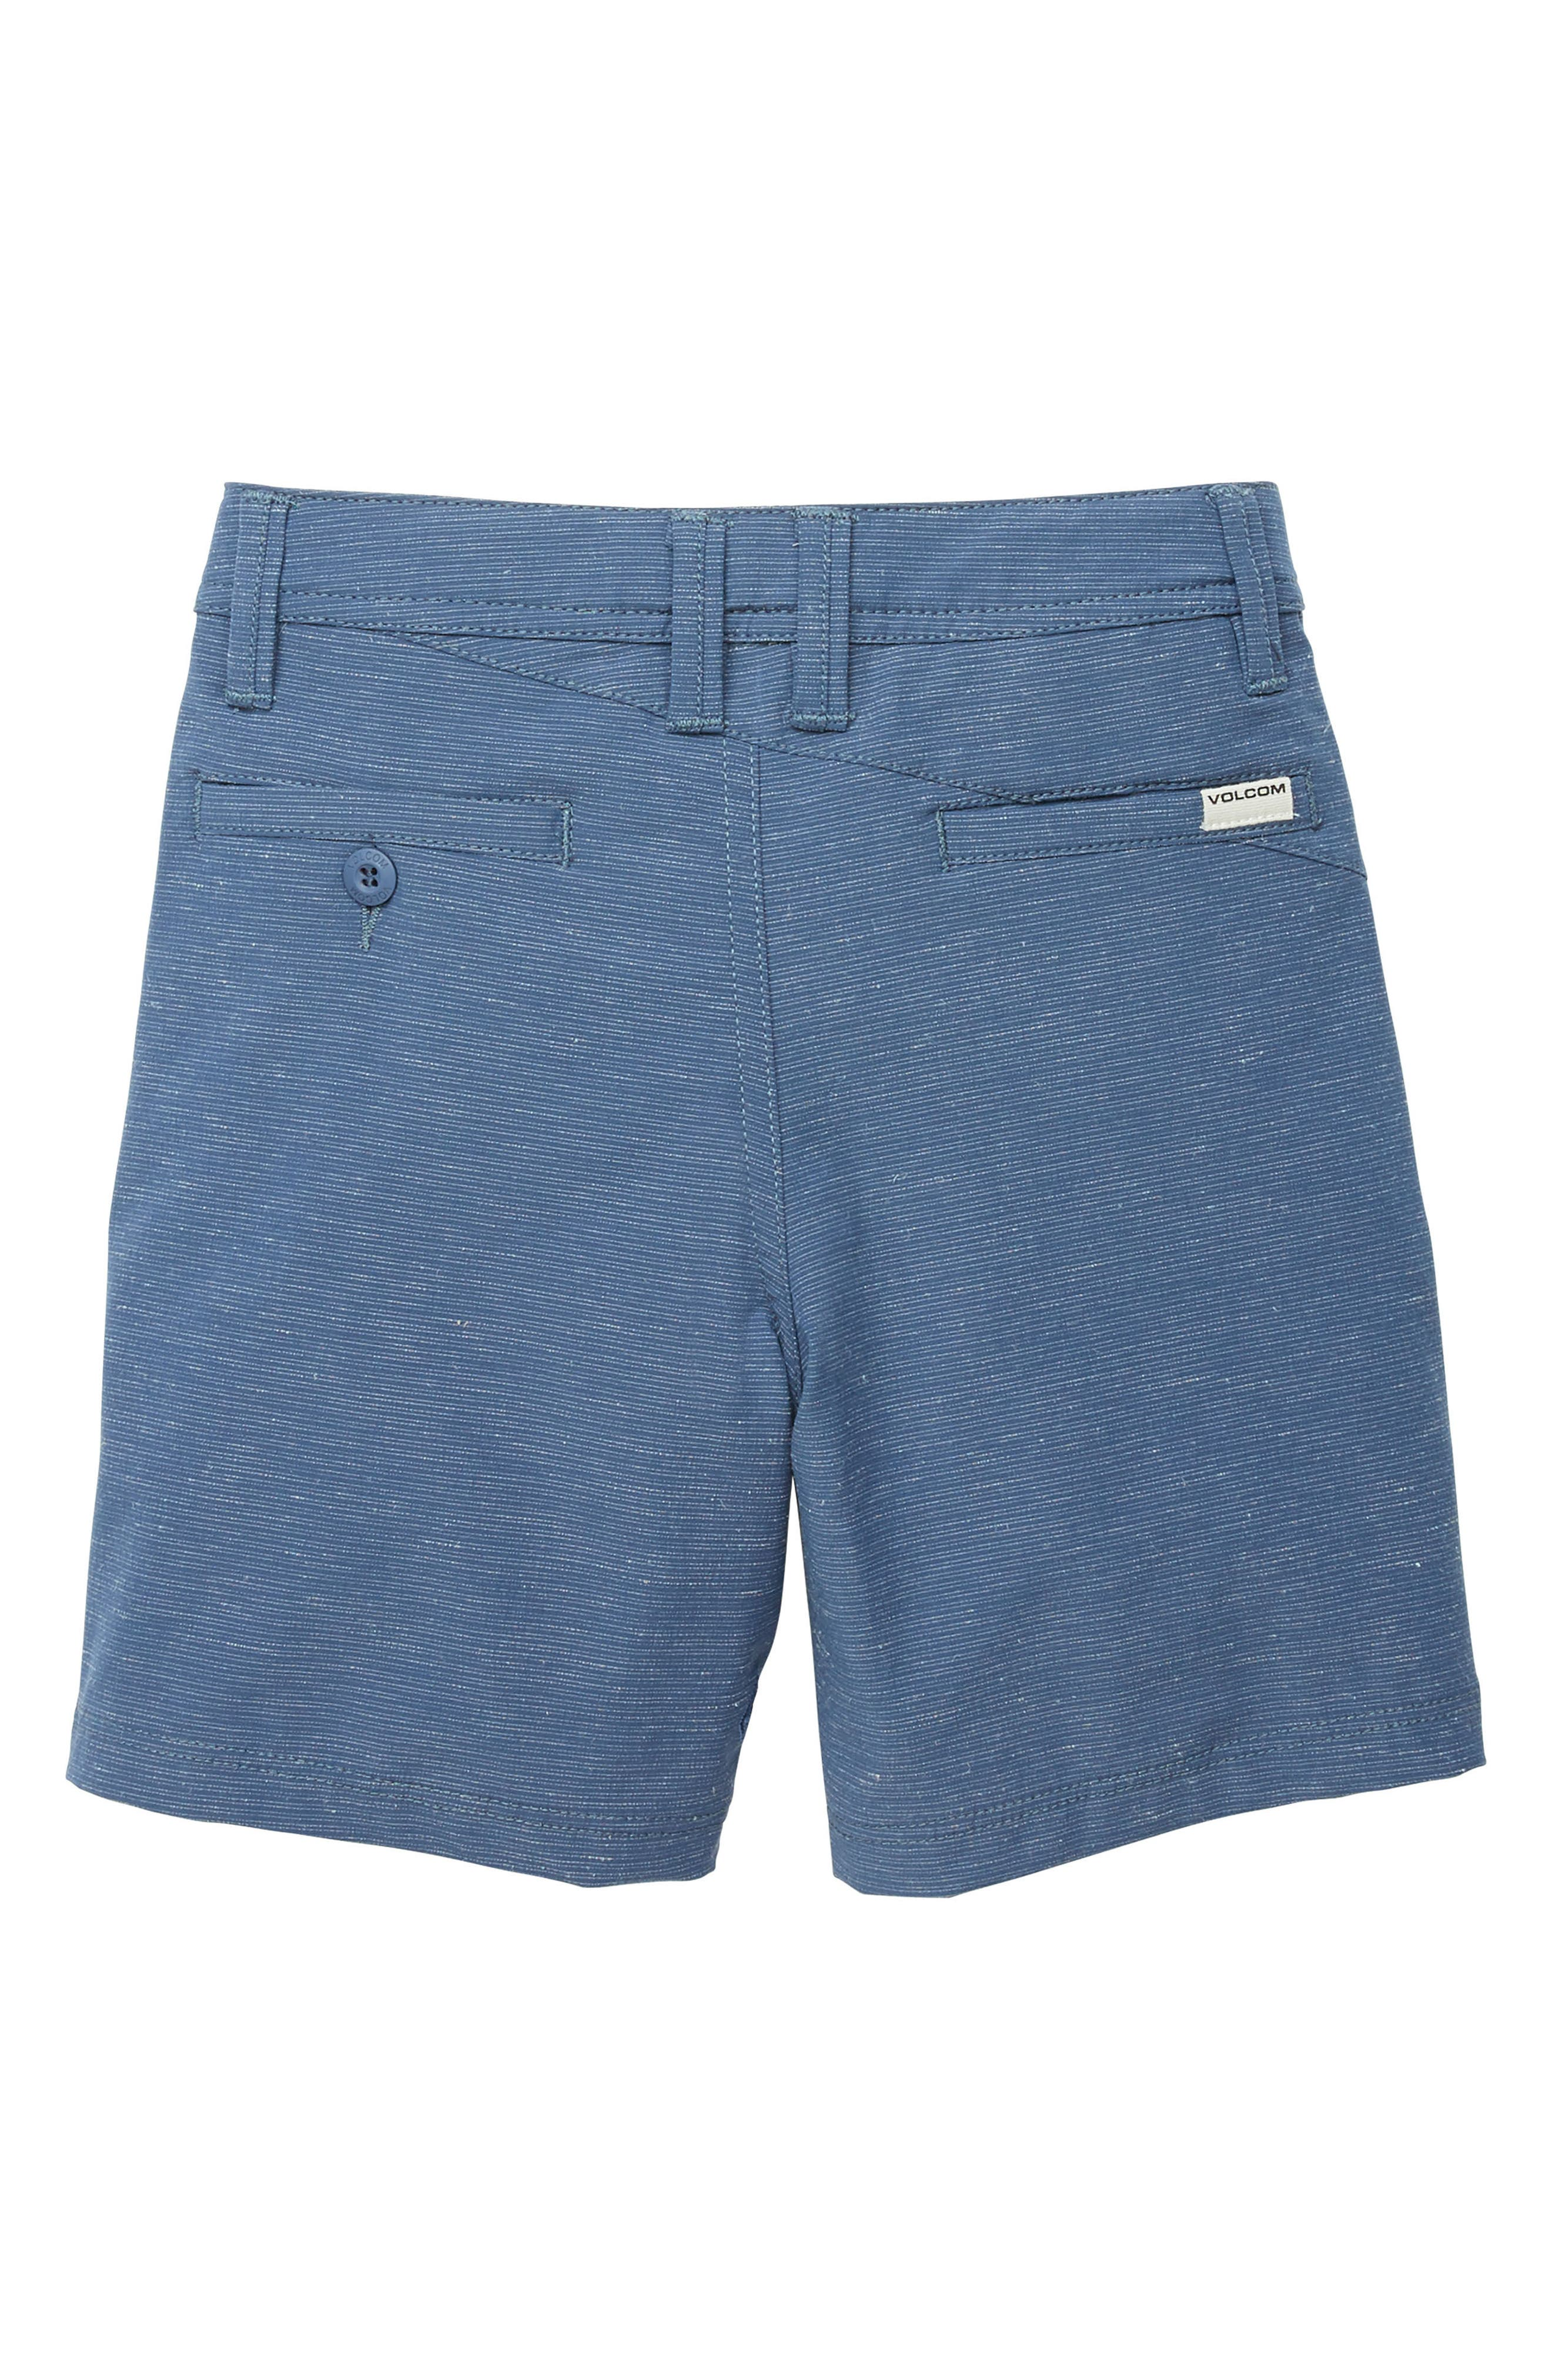 Surf N' Turf Slub Hybrid Shorts,                             Alternate thumbnail 2, color,                             DEEP WATER